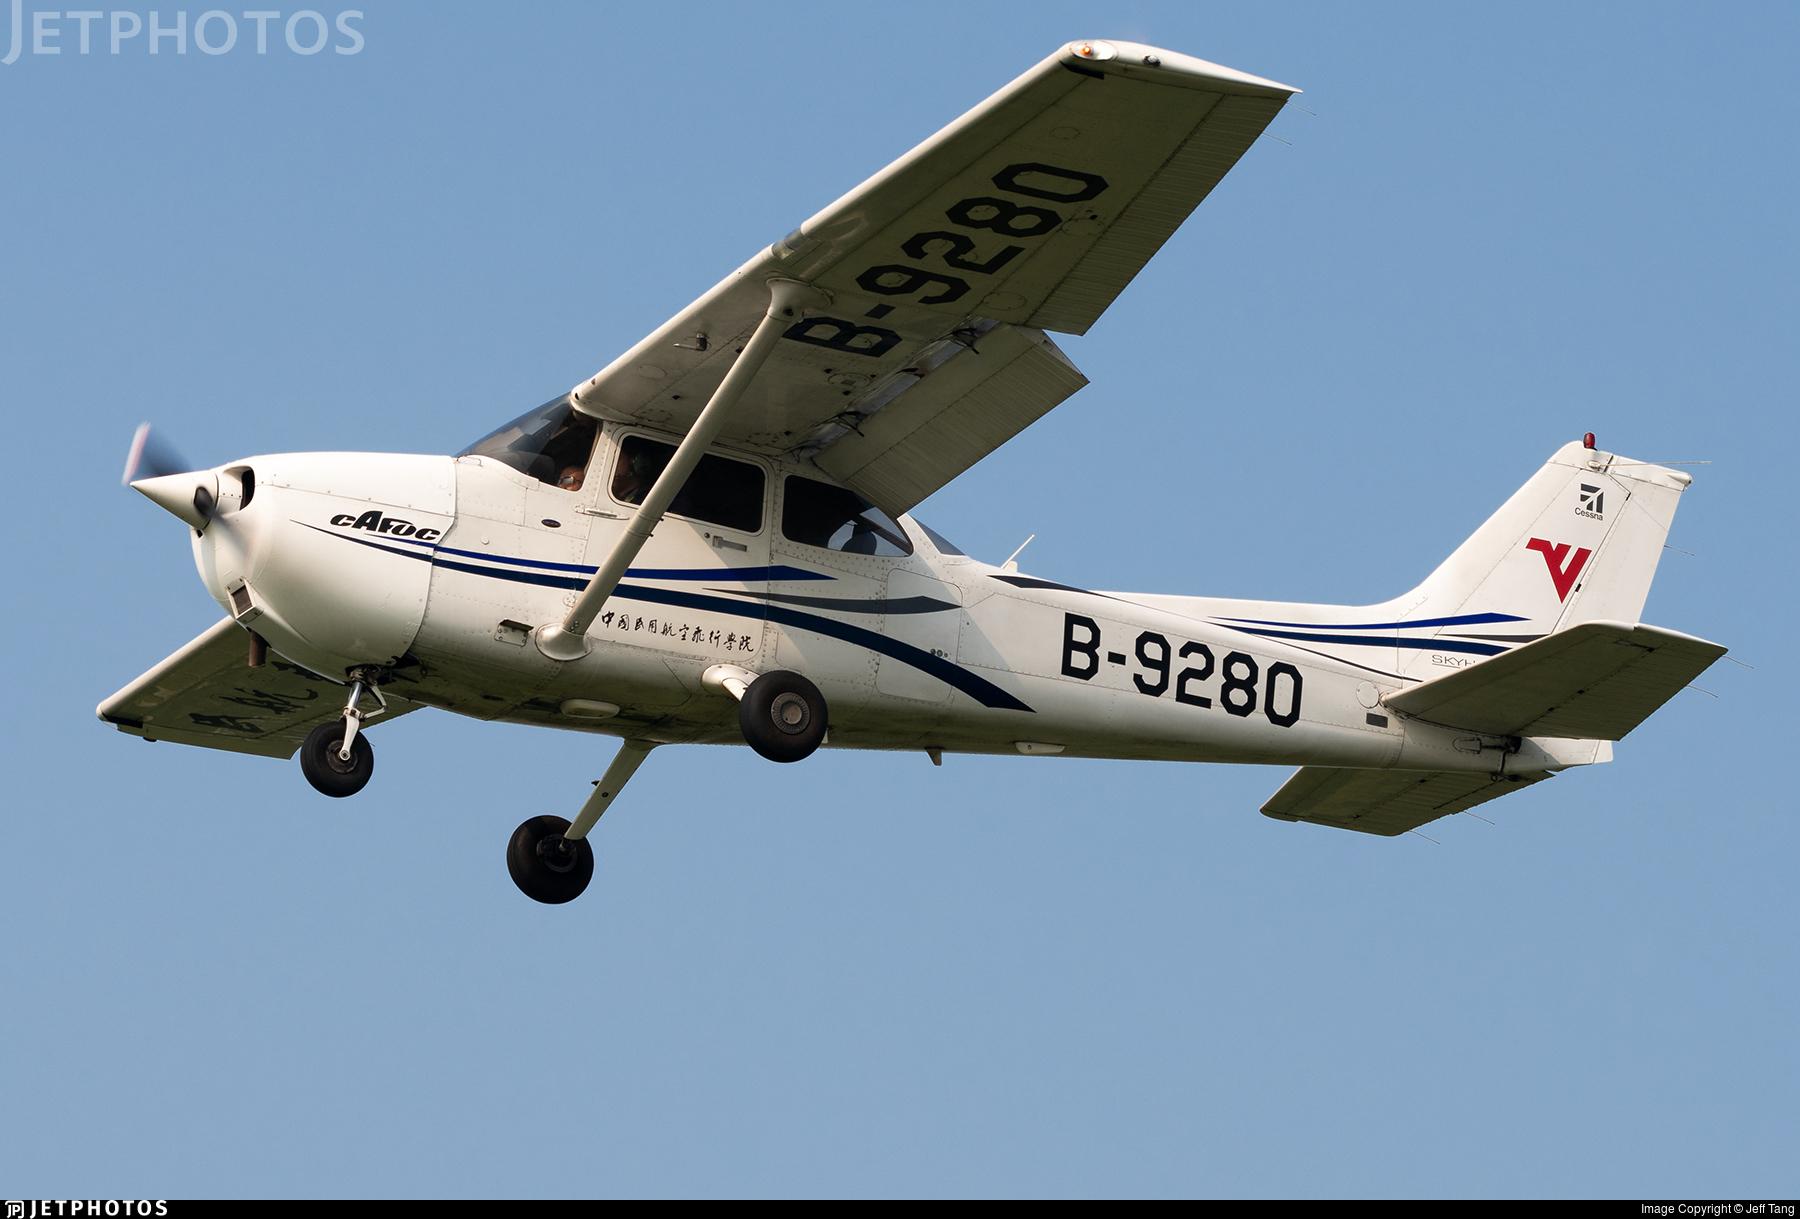 B-9280 - Cessna 172R Skyhawk - Civil Aviation Flight University of China